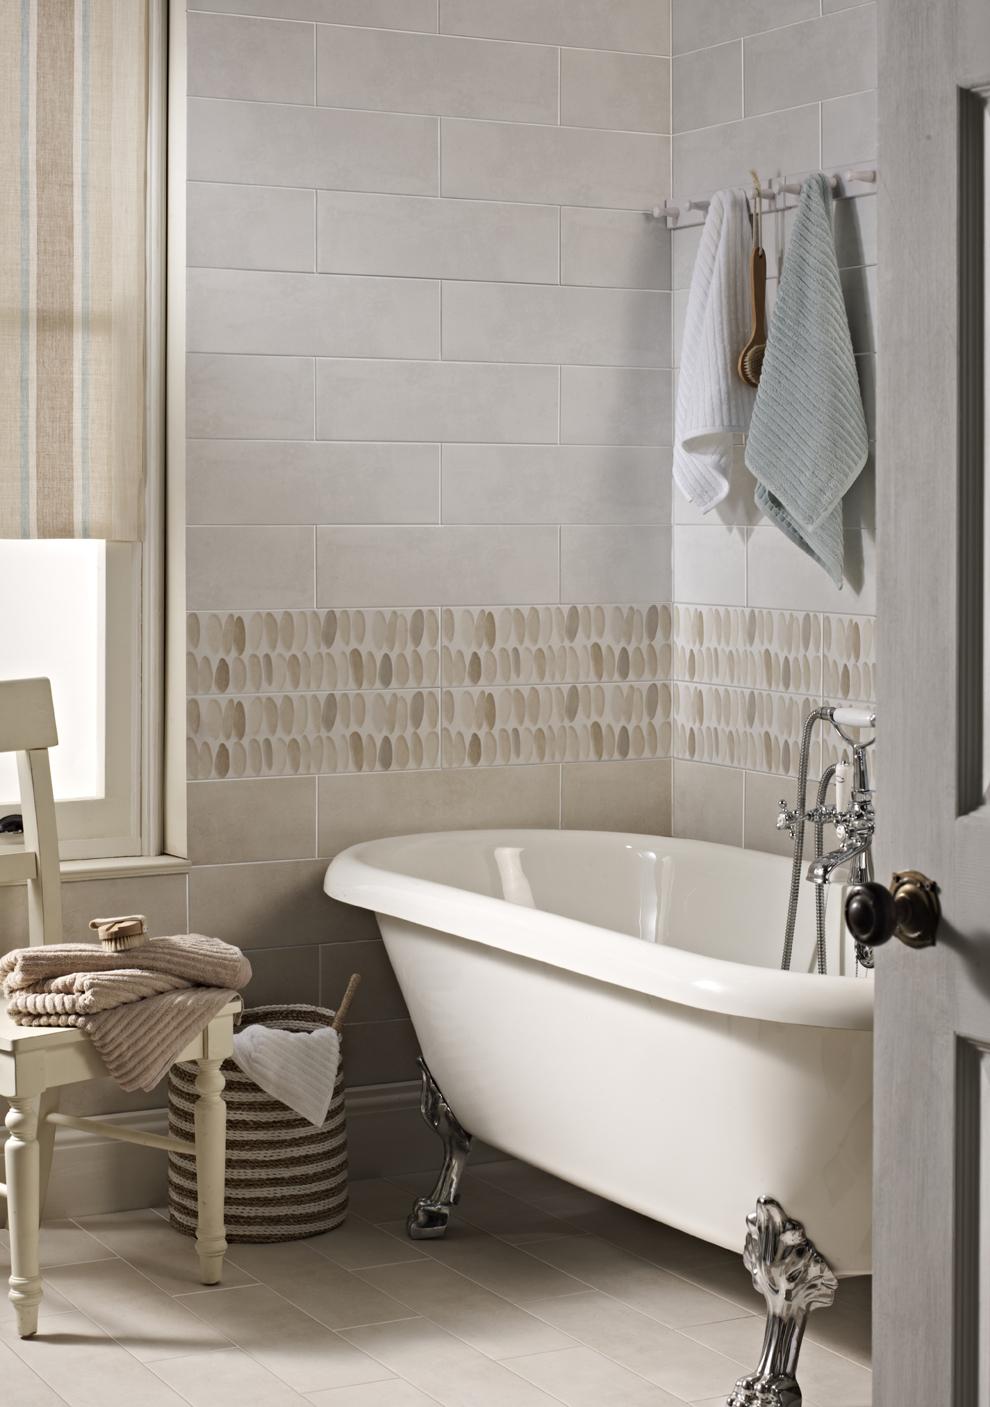 Simple Wintergarden Tiles By Laura Ashley  Bathroom Tiles  Bathroom Design